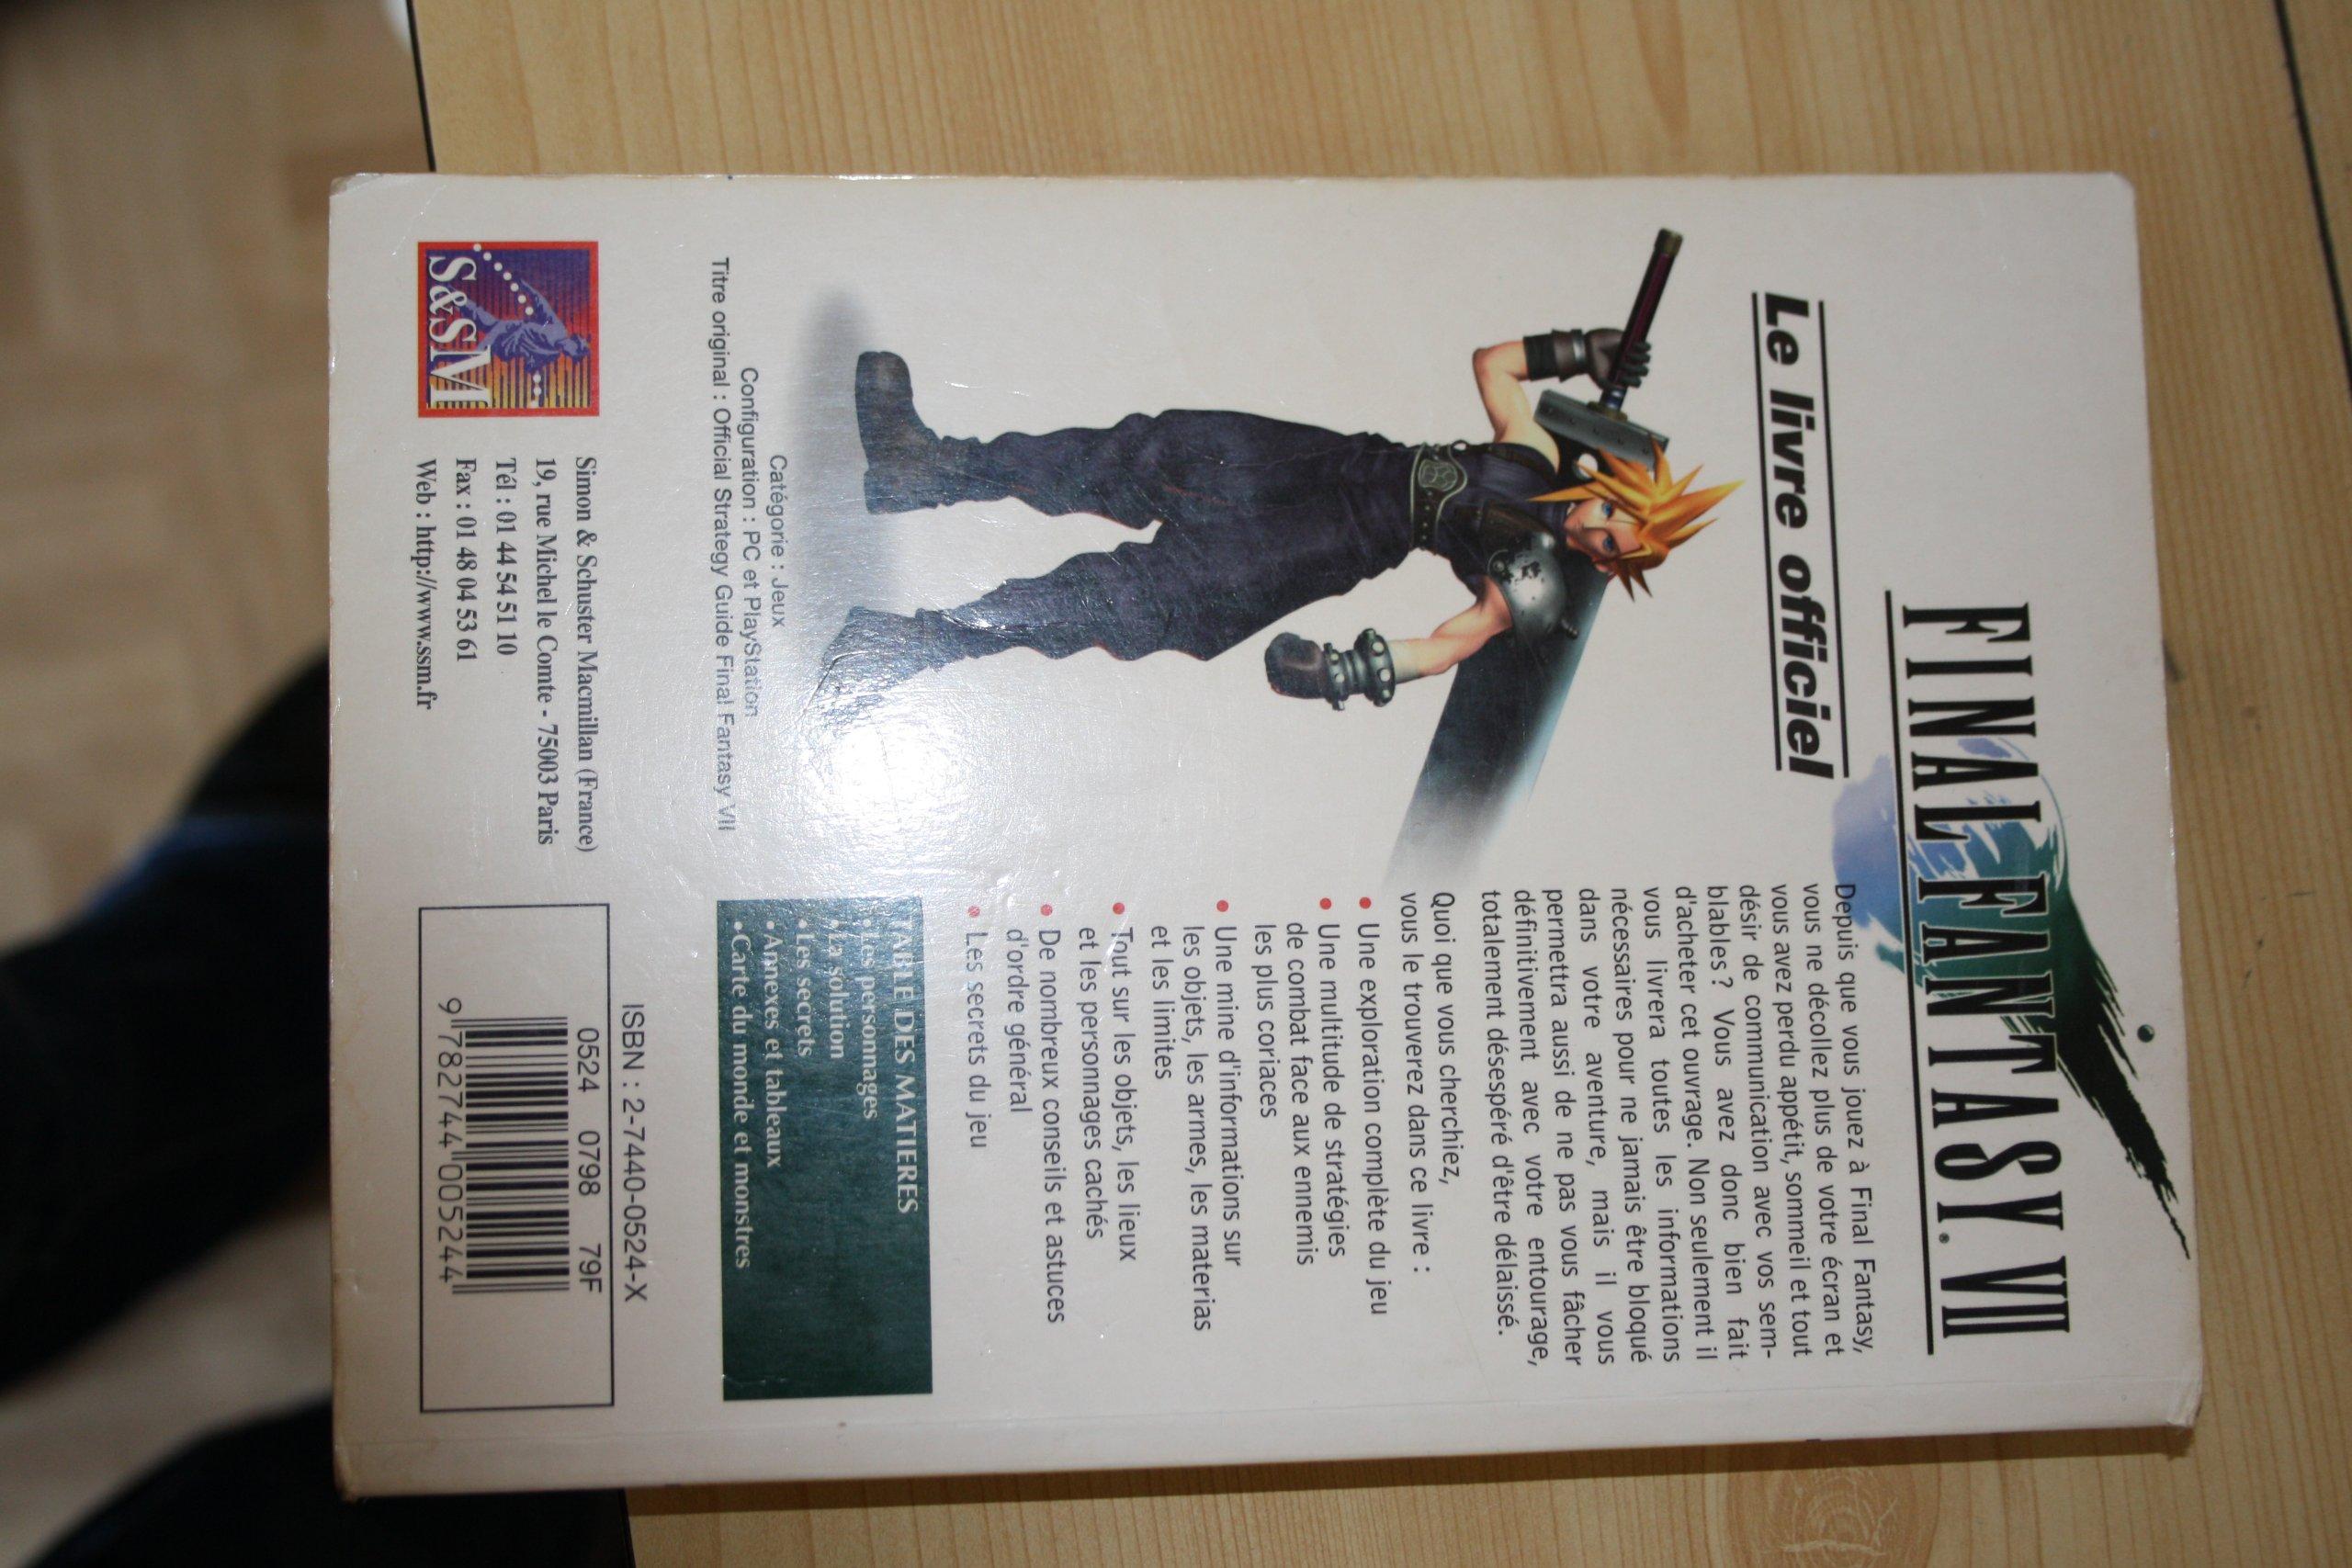 Final Fantasy Vii Guide Officiel 9782744005244 Amazon Com